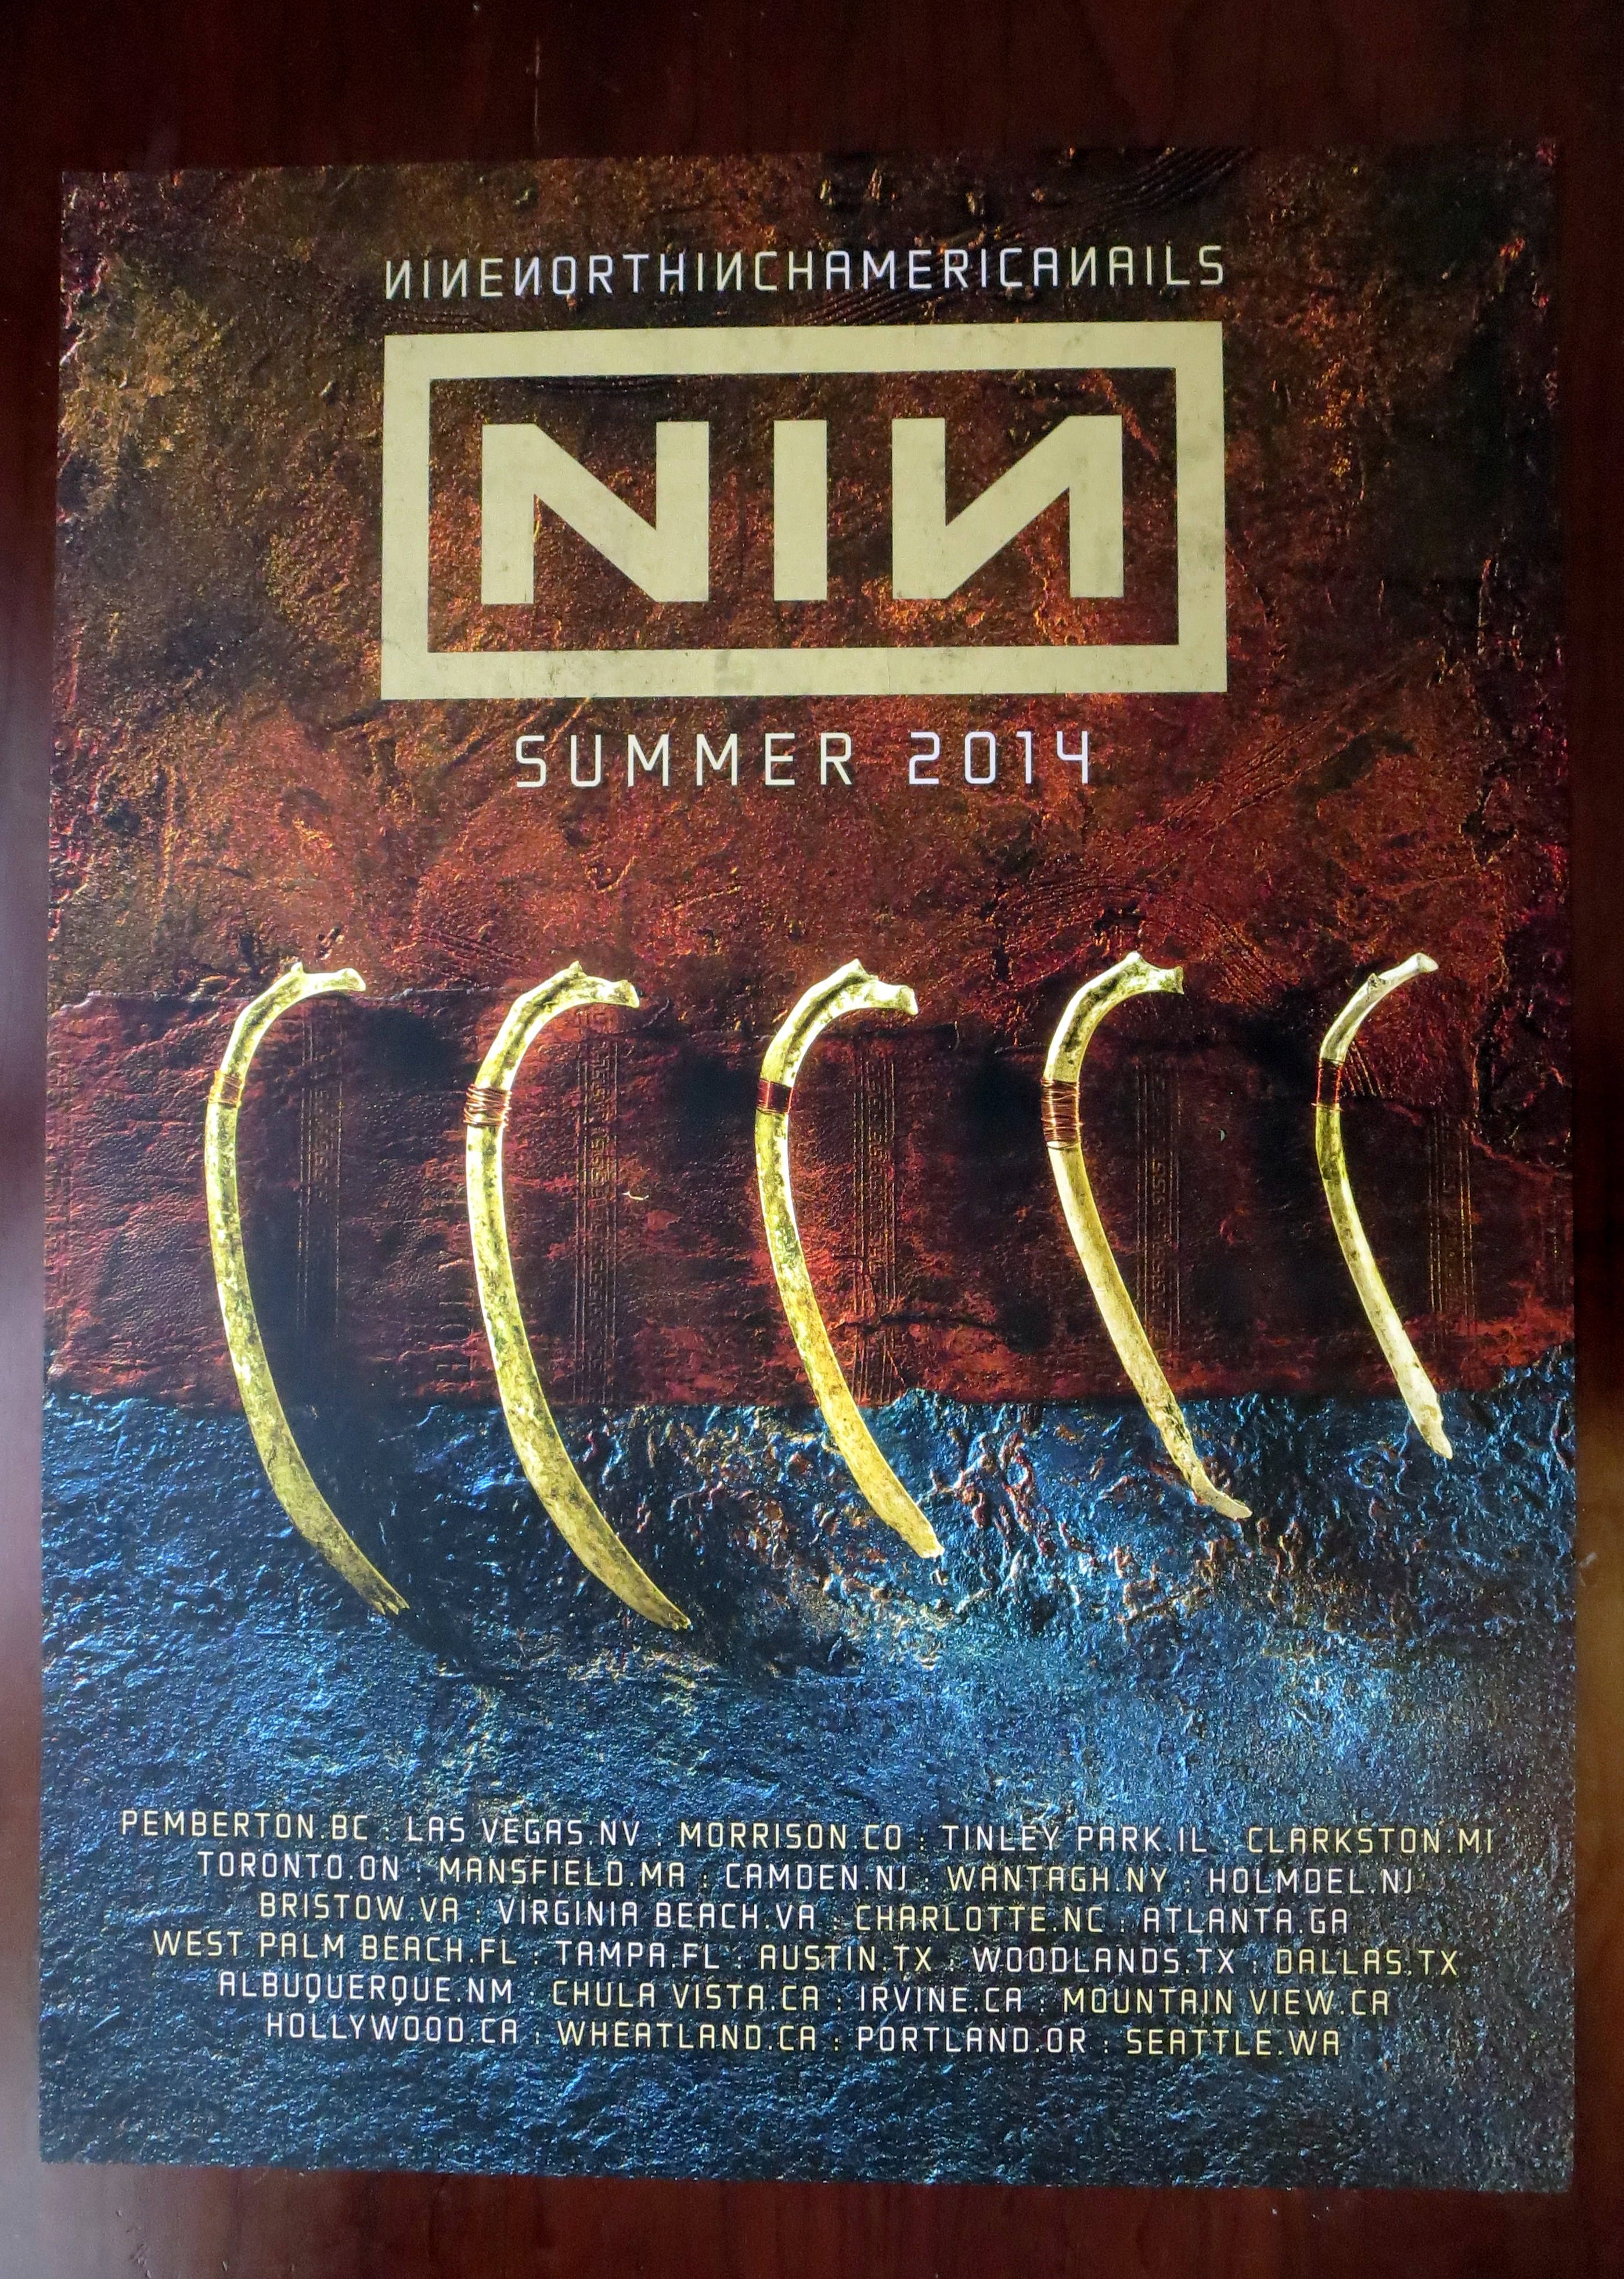 NIN Soundgarden Tour Merchandise thread [Archive] - Page 2 - Echoing ...